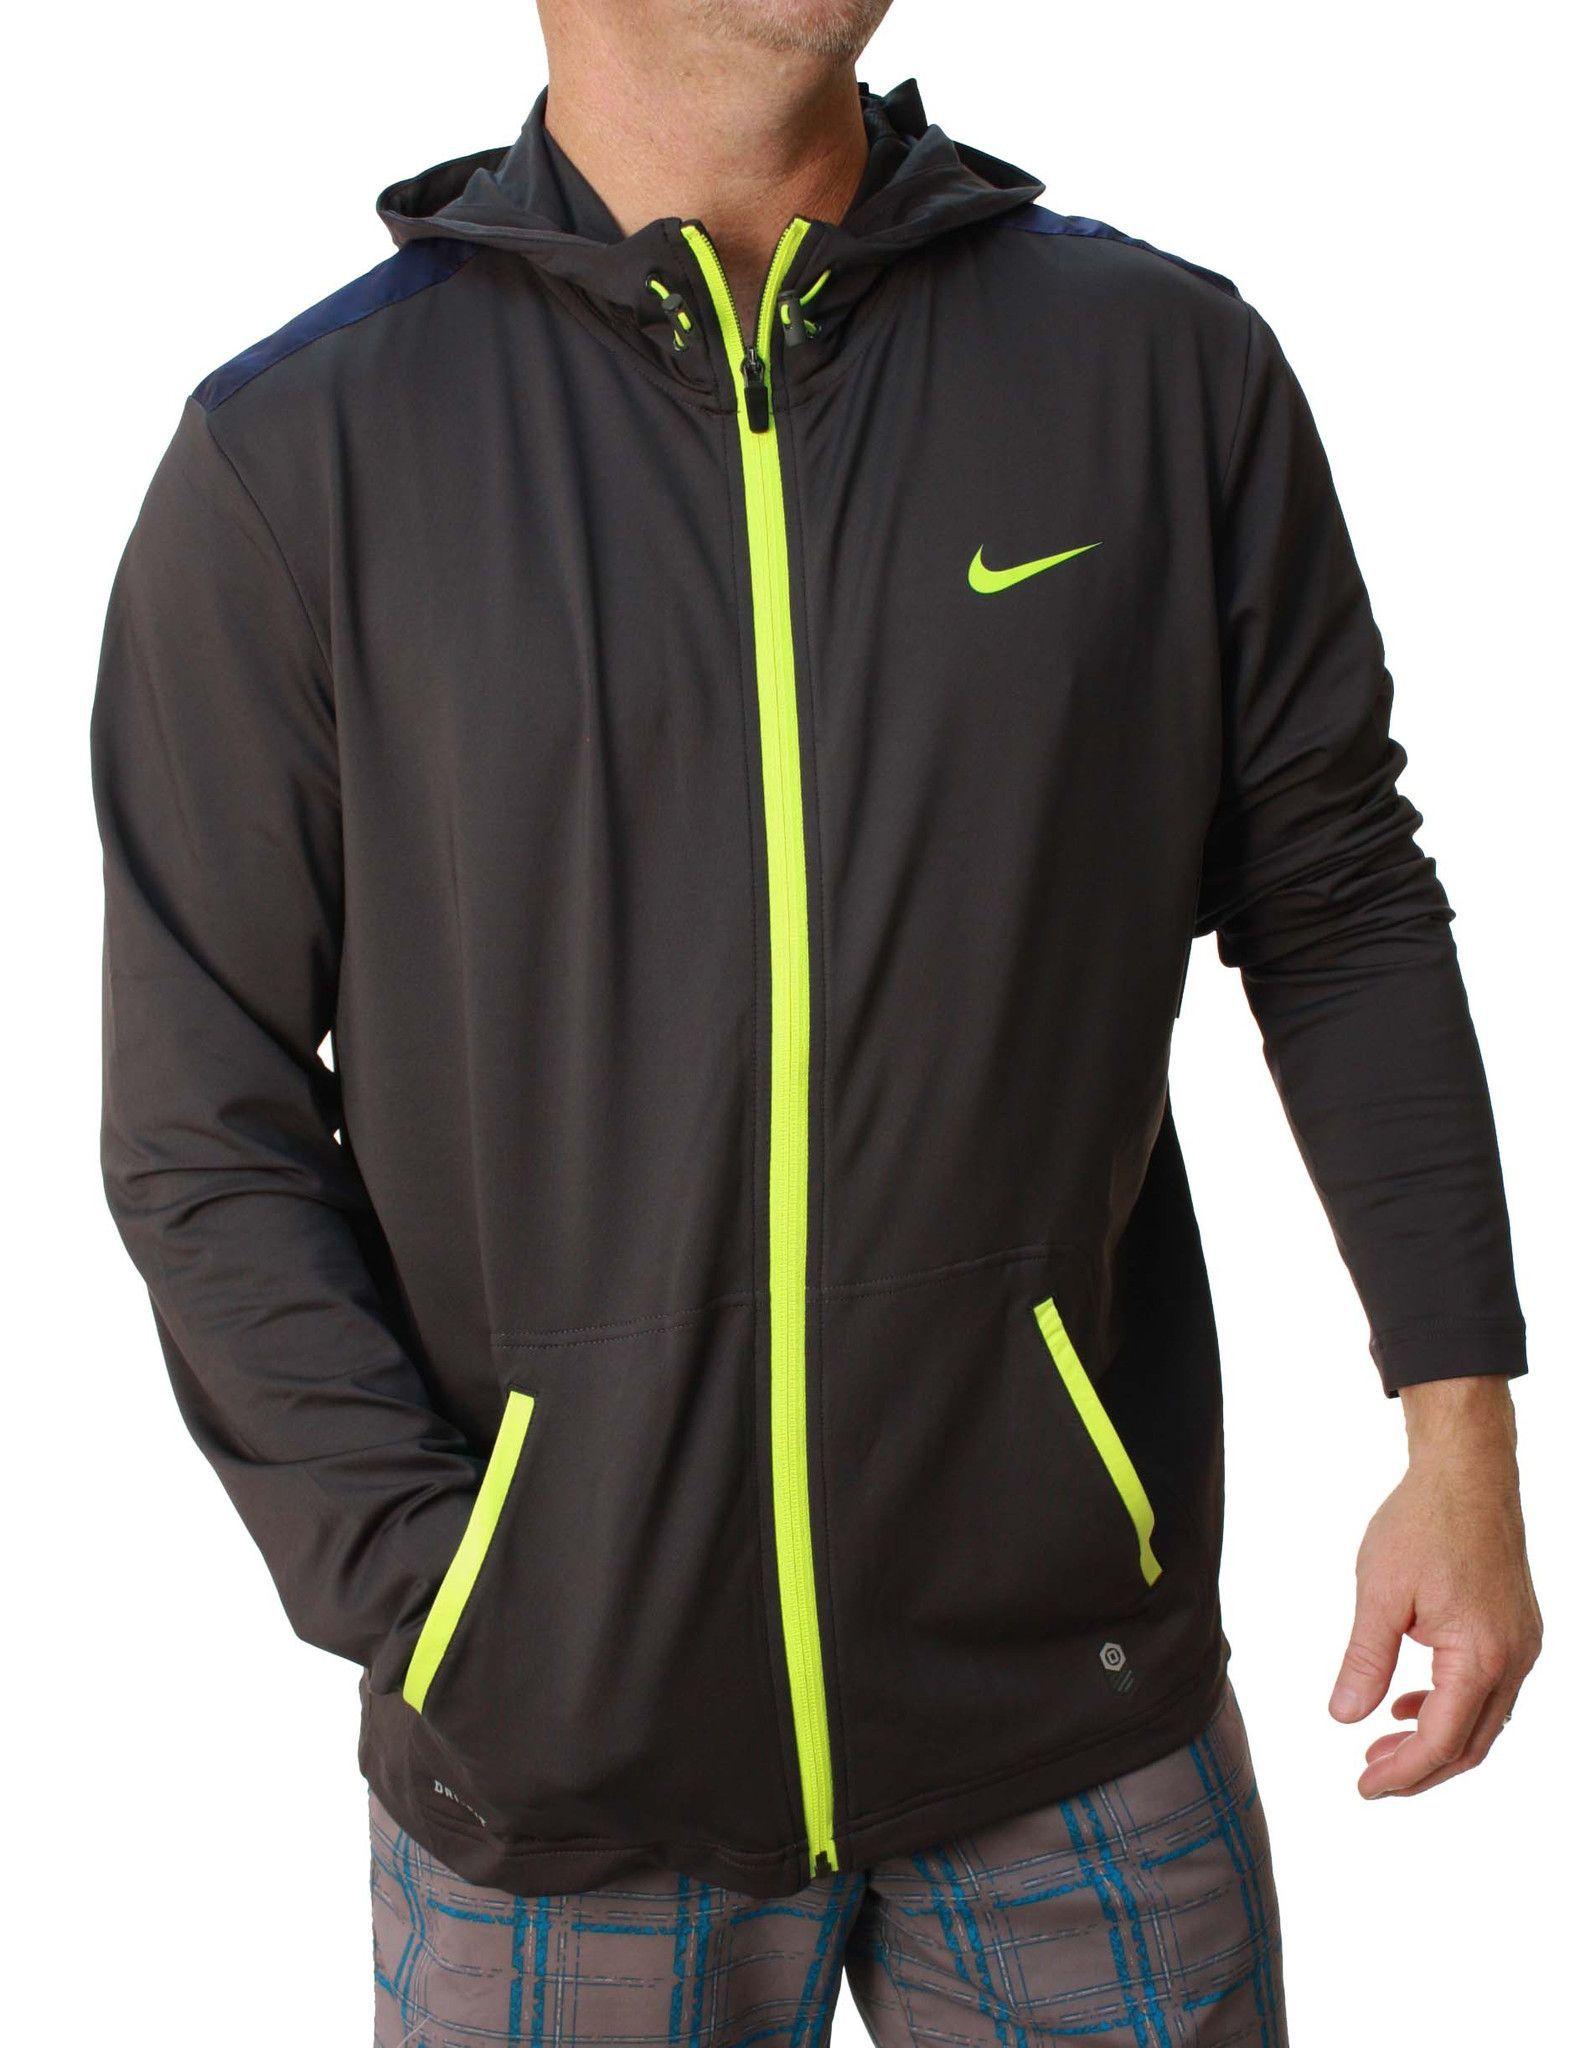 82673bb9 Nike Men's Dri-Fit OT Lightweight Full Zip Basketball Hoodie | Nike ...